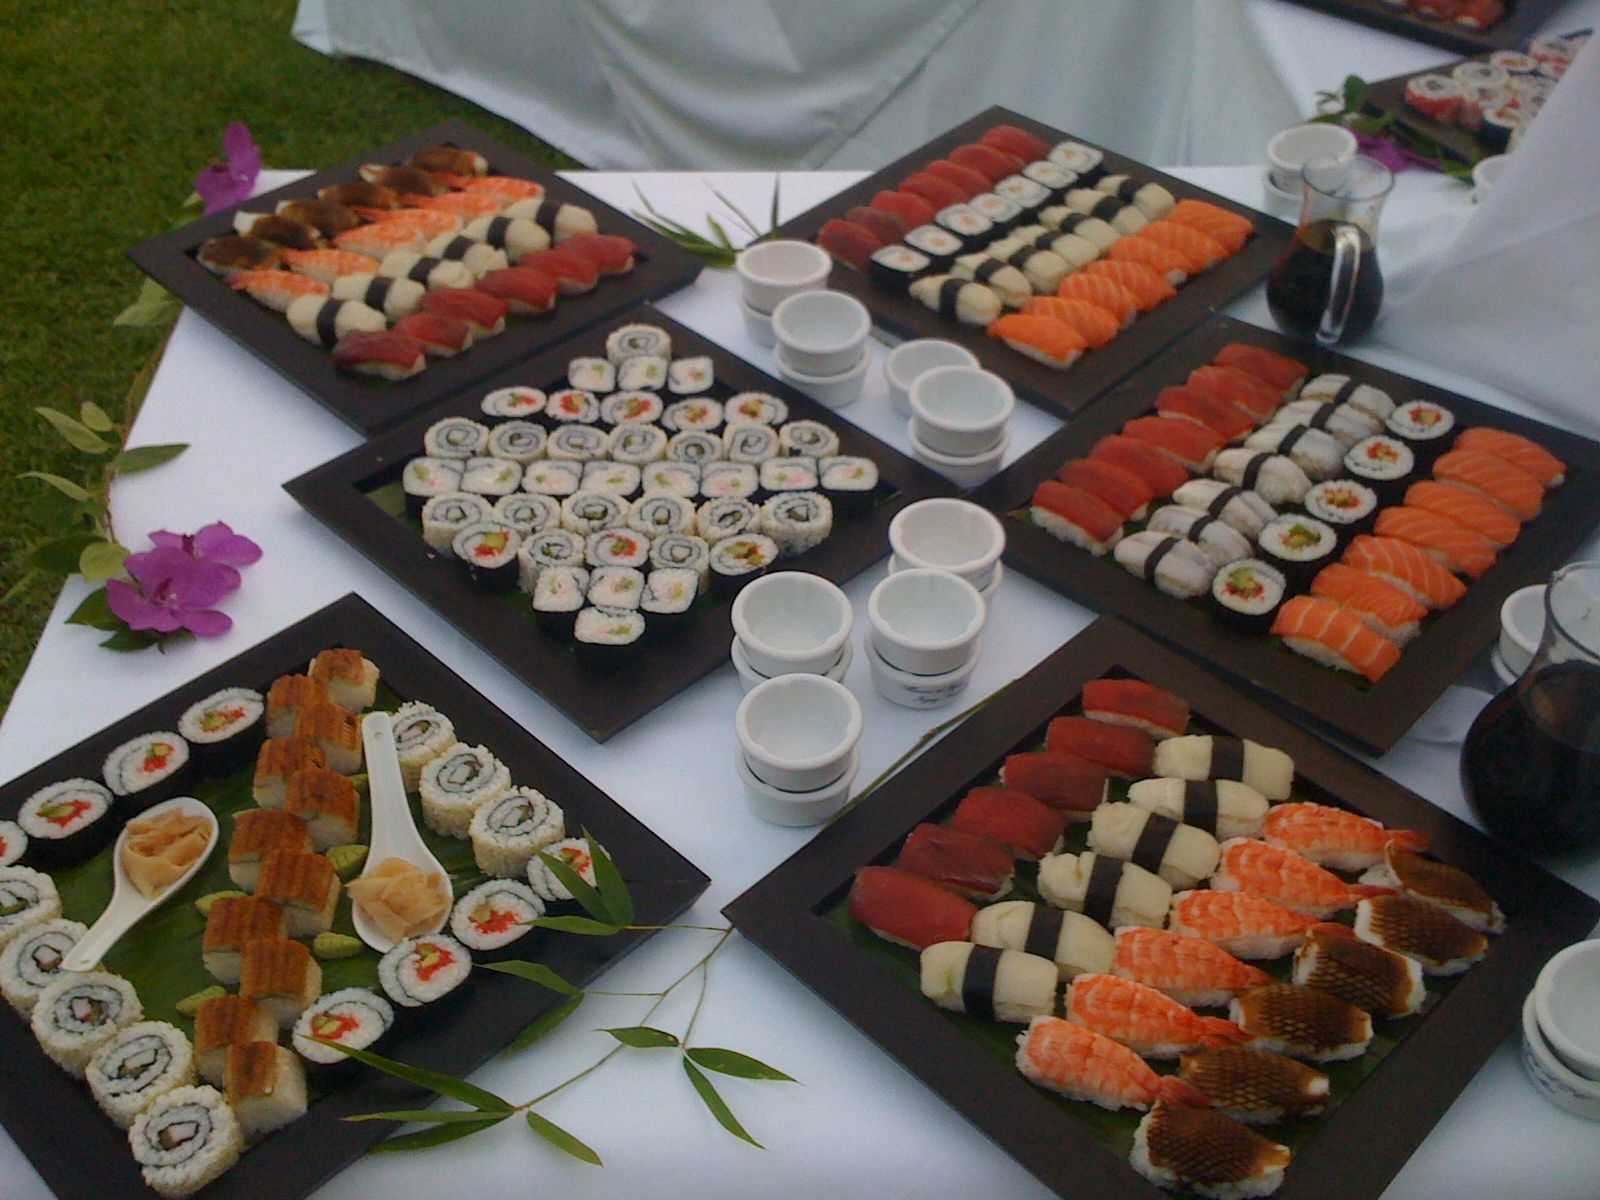 Sushi bar los monteros hotel spa restaurants bars gastronomy pinterest catering de - Bandejas para sushi ...